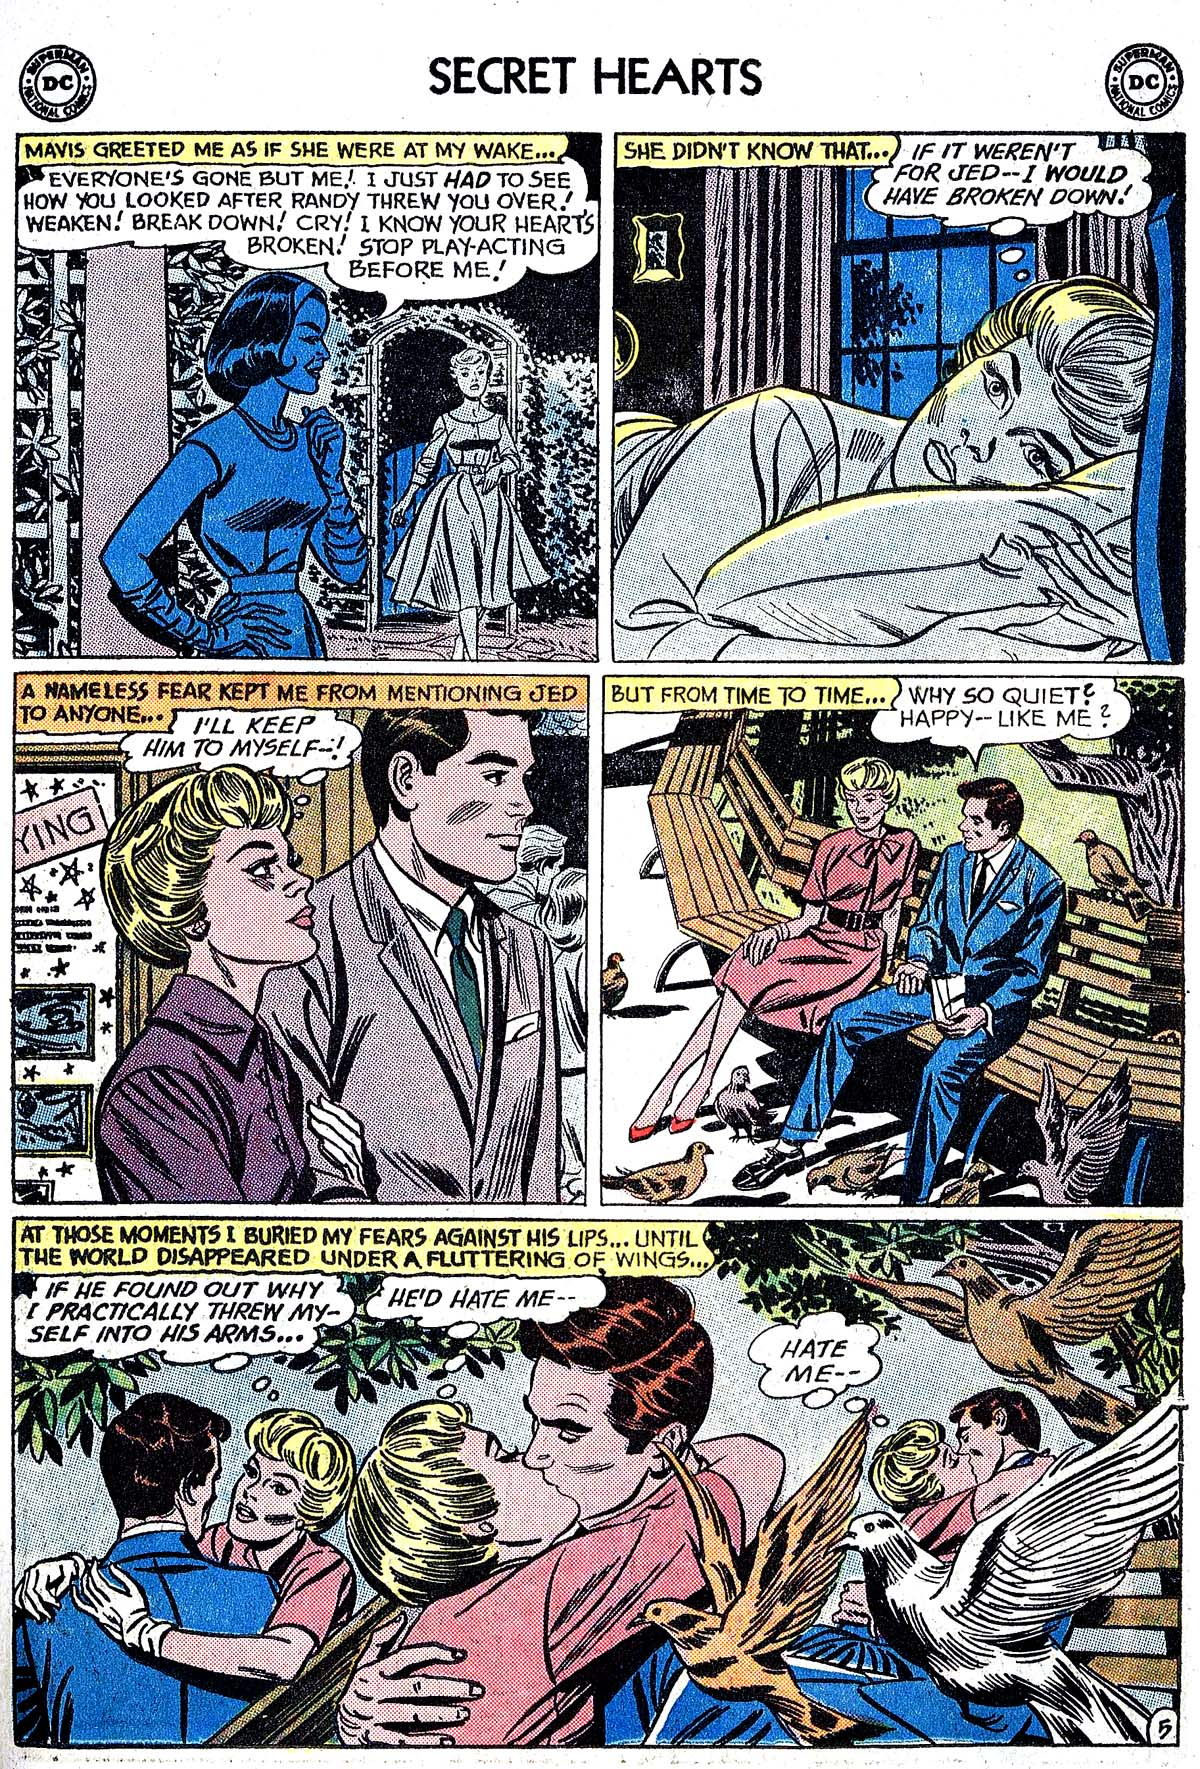 Read online Secret Hearts comic -  Issue #82 - 31